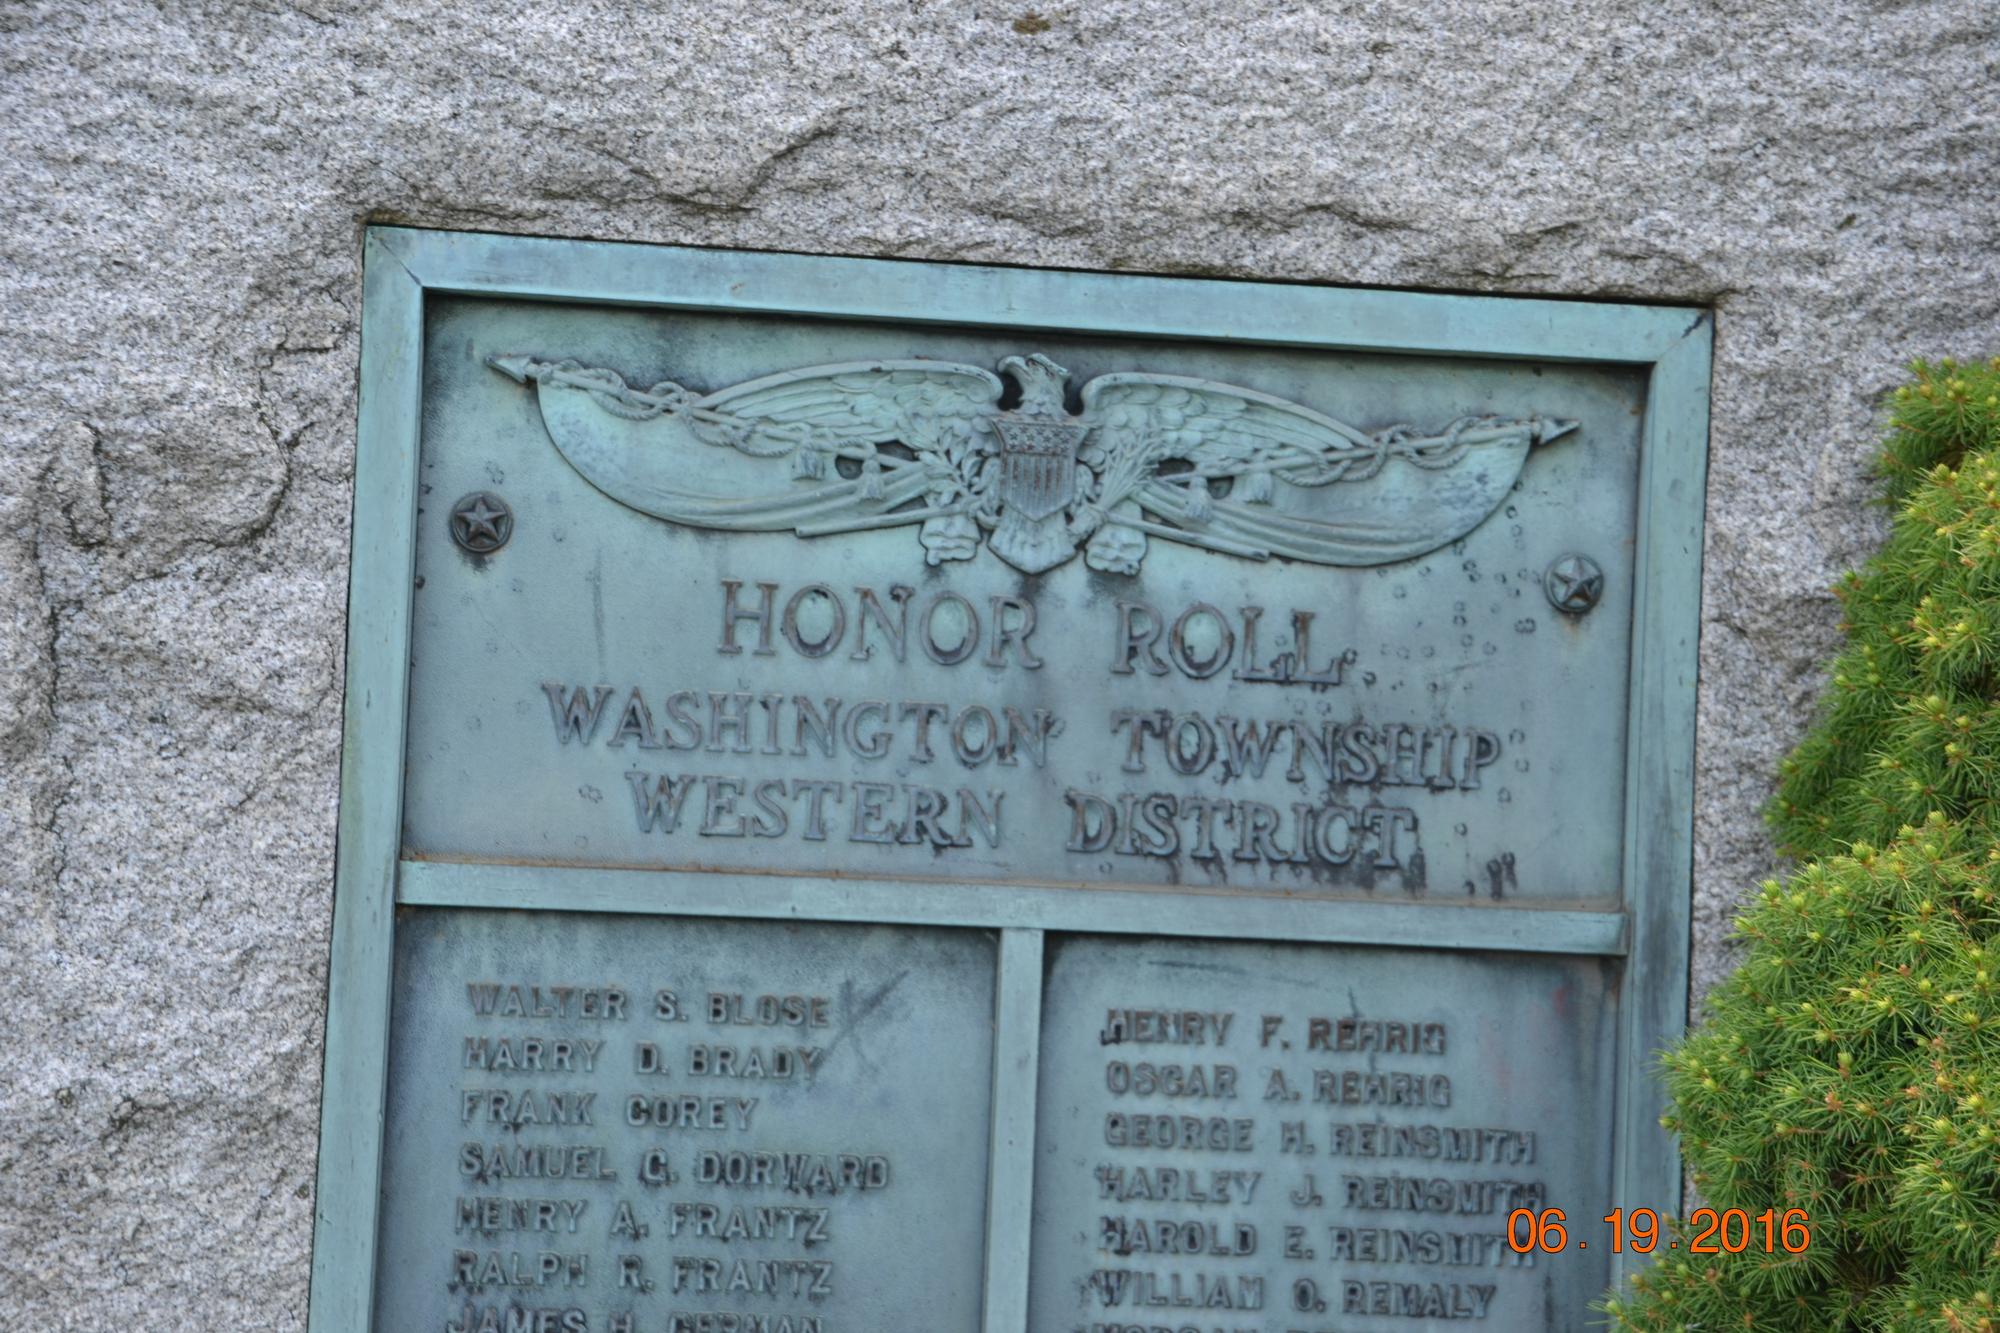 Washington Township Western District World War I Honor Roll (PA)